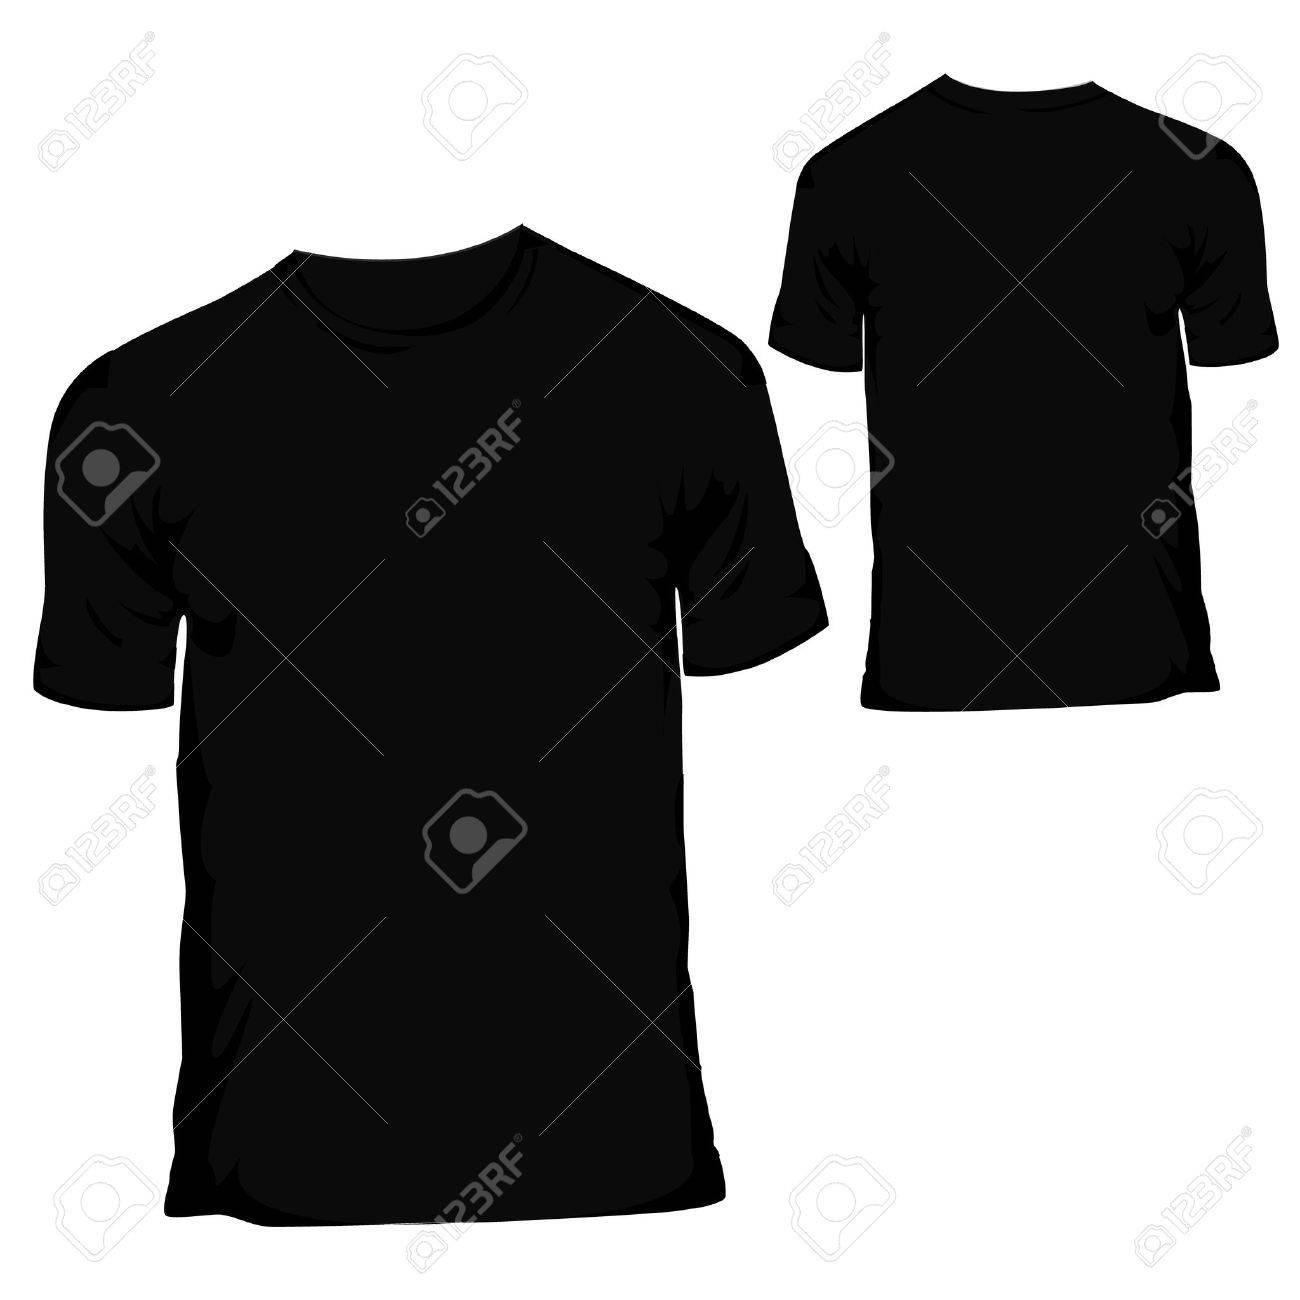 Black t shirt vector -  Vector Black Blank T Shirt Design Template For Menswear Download